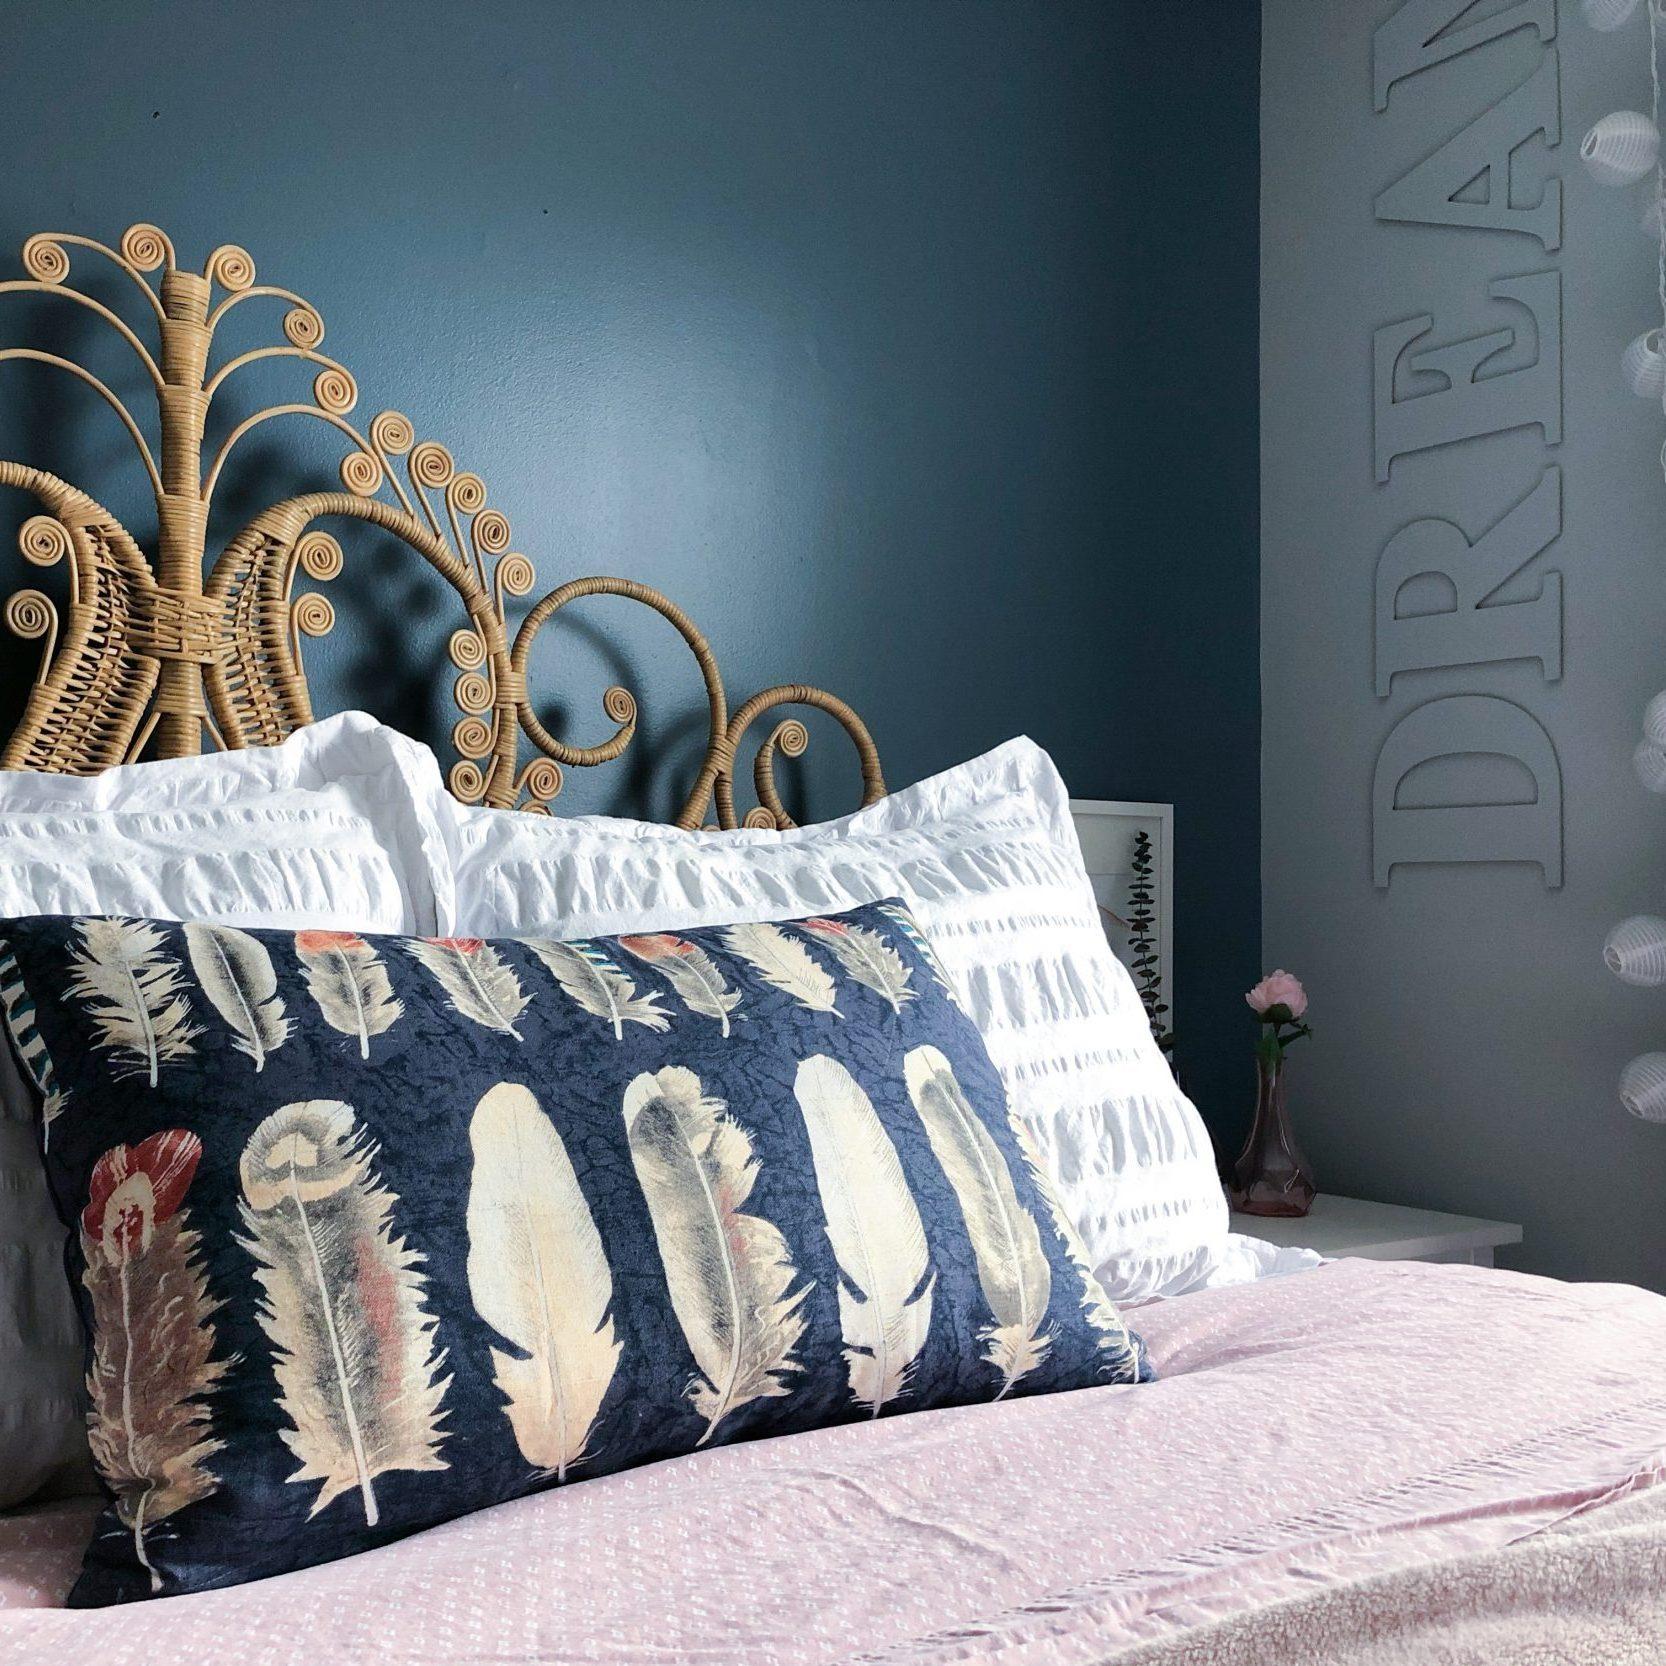 House Tour Update // Bedroom